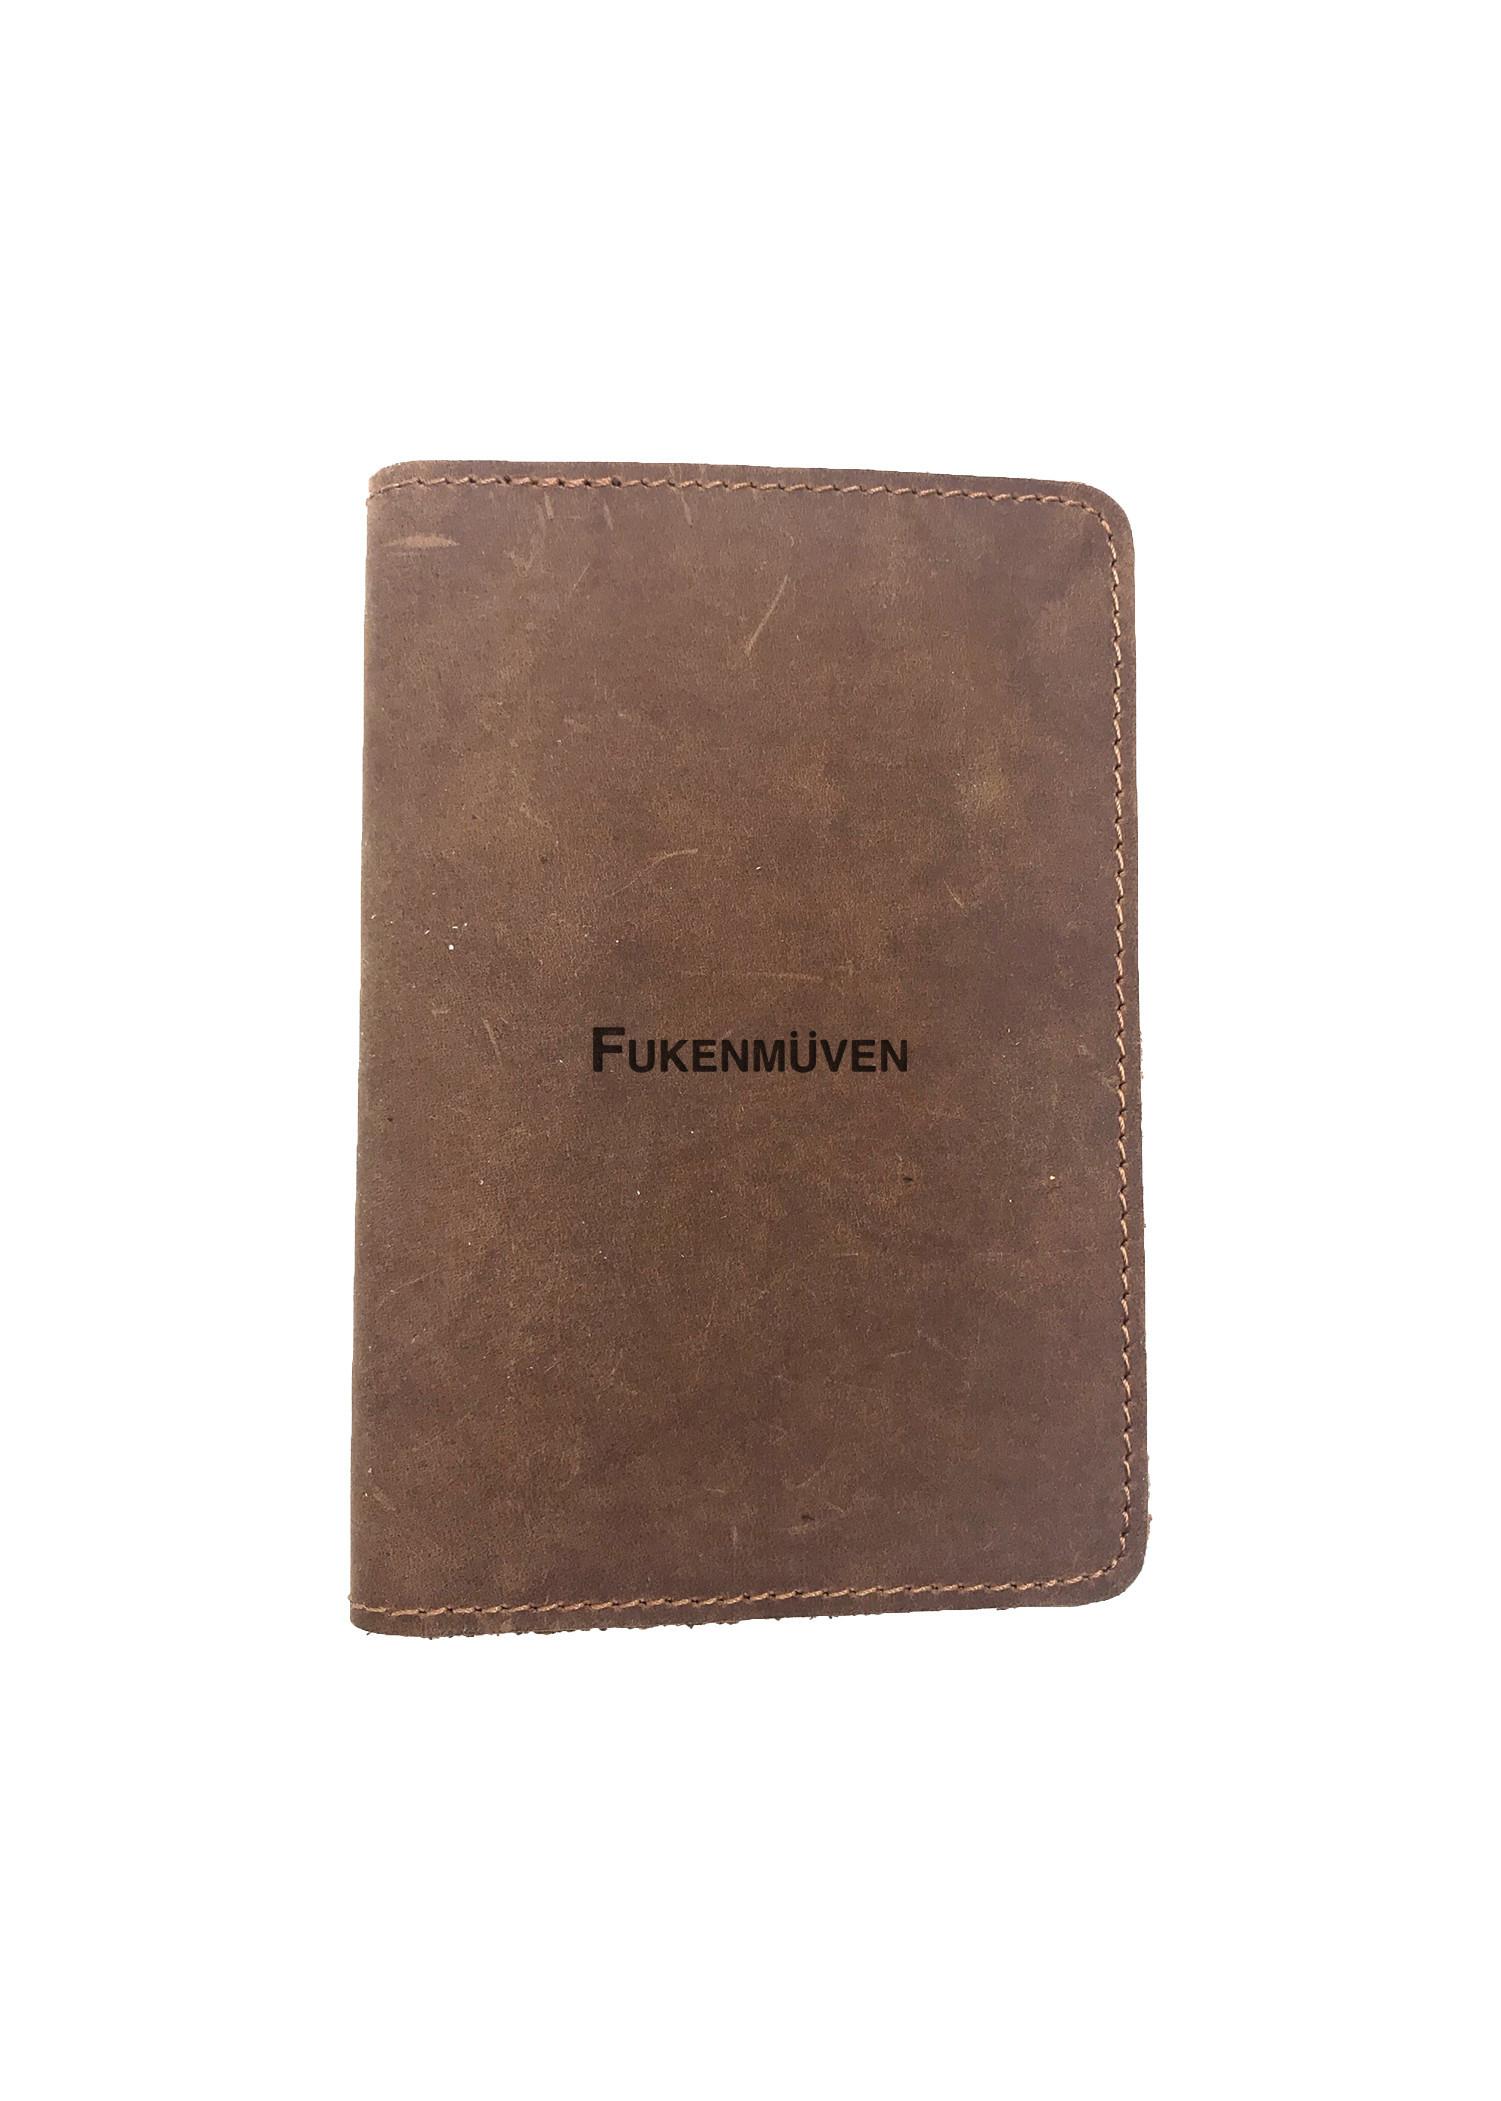 Passport Cover Bao Da Hộ Chiếu Da Sáp Khắc Hình Chữ FUKENMUVEN TEXT (BROWN)